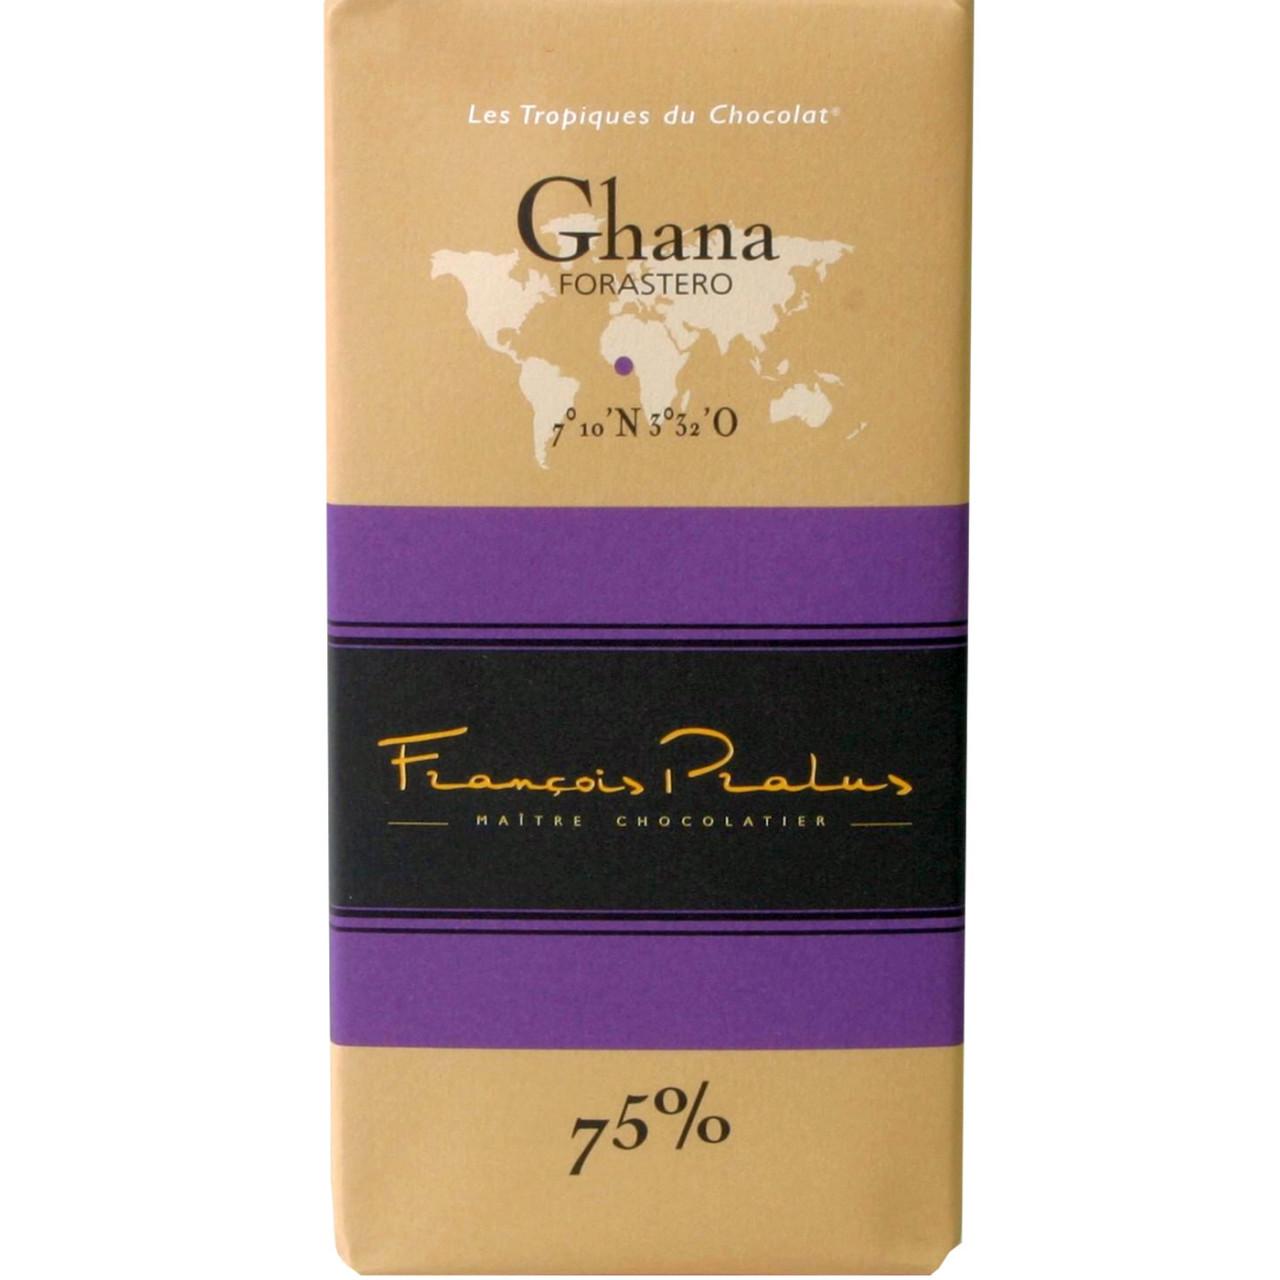 dunkle Schokolade, 75% Ghana, Forastero, Afrika, Africa, Afrique, dark chocolate, chocolat noir, single origin chocolate - Tablette de chocolat, France, chocolat français - Chocolats-De-Luxe